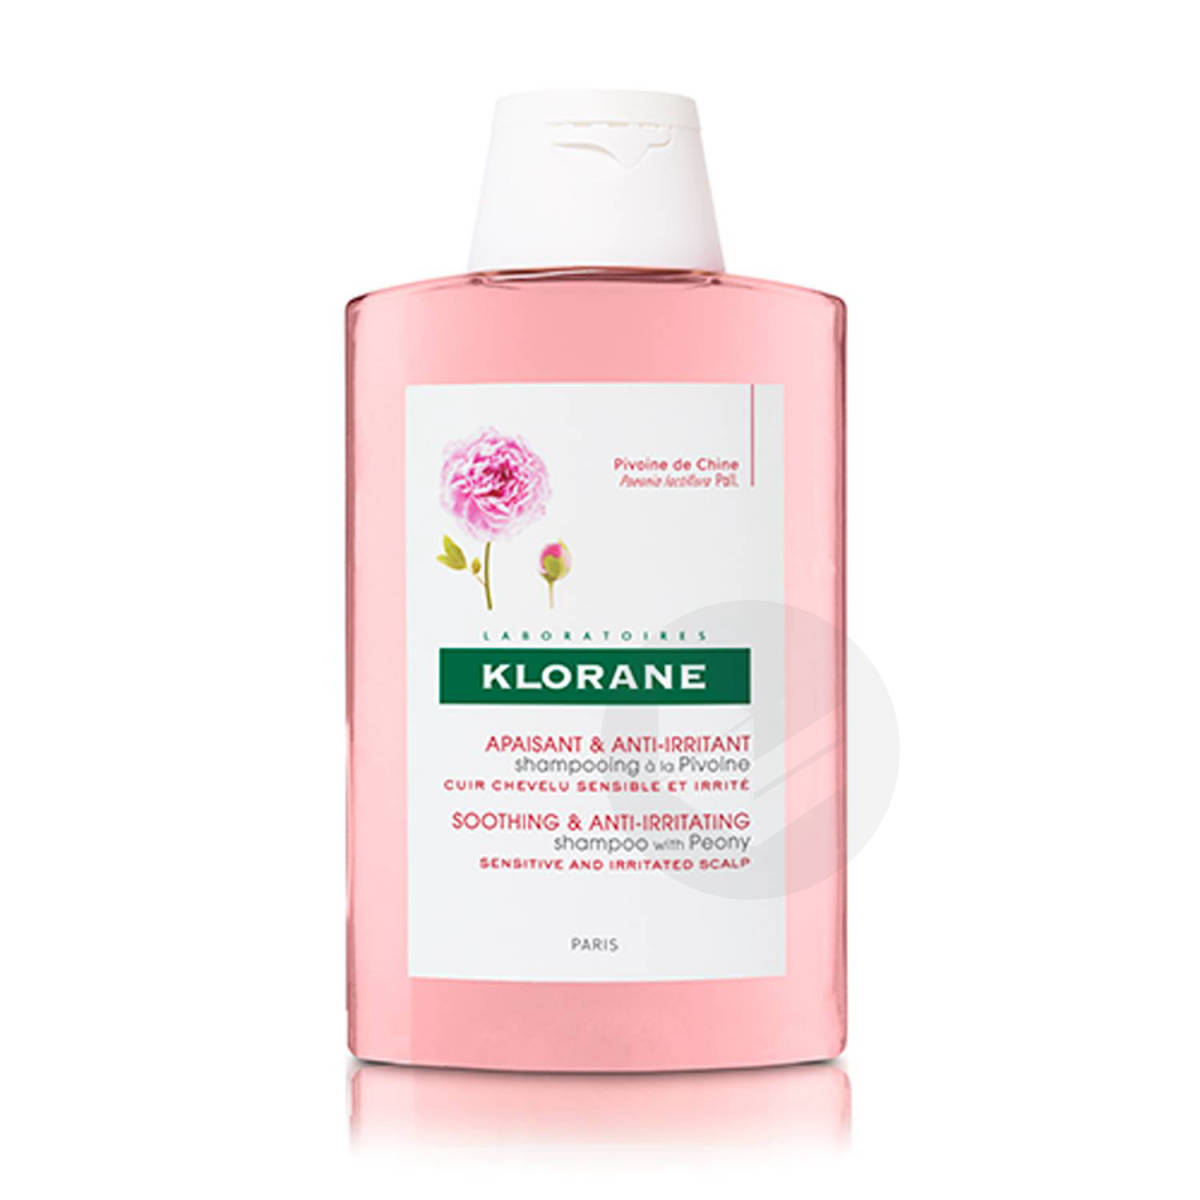 Shampooing Apaisant & Anti-Irritant à la Pivoine 200ml